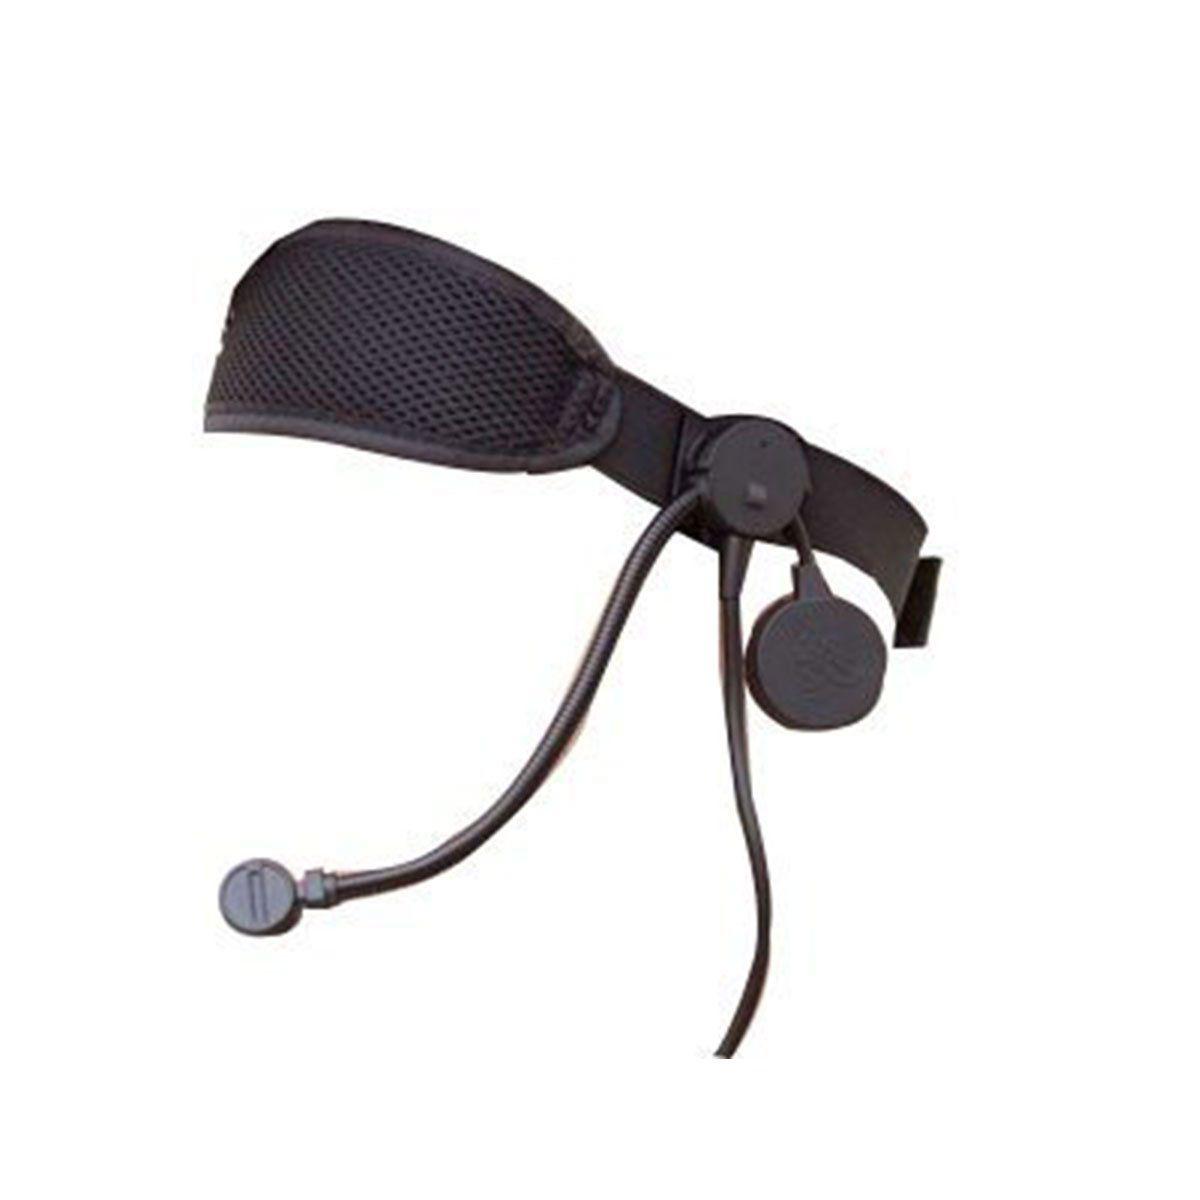 Fone com Microfone para Rádio Comunicador Z043 BK ZCobra Tectical Headset